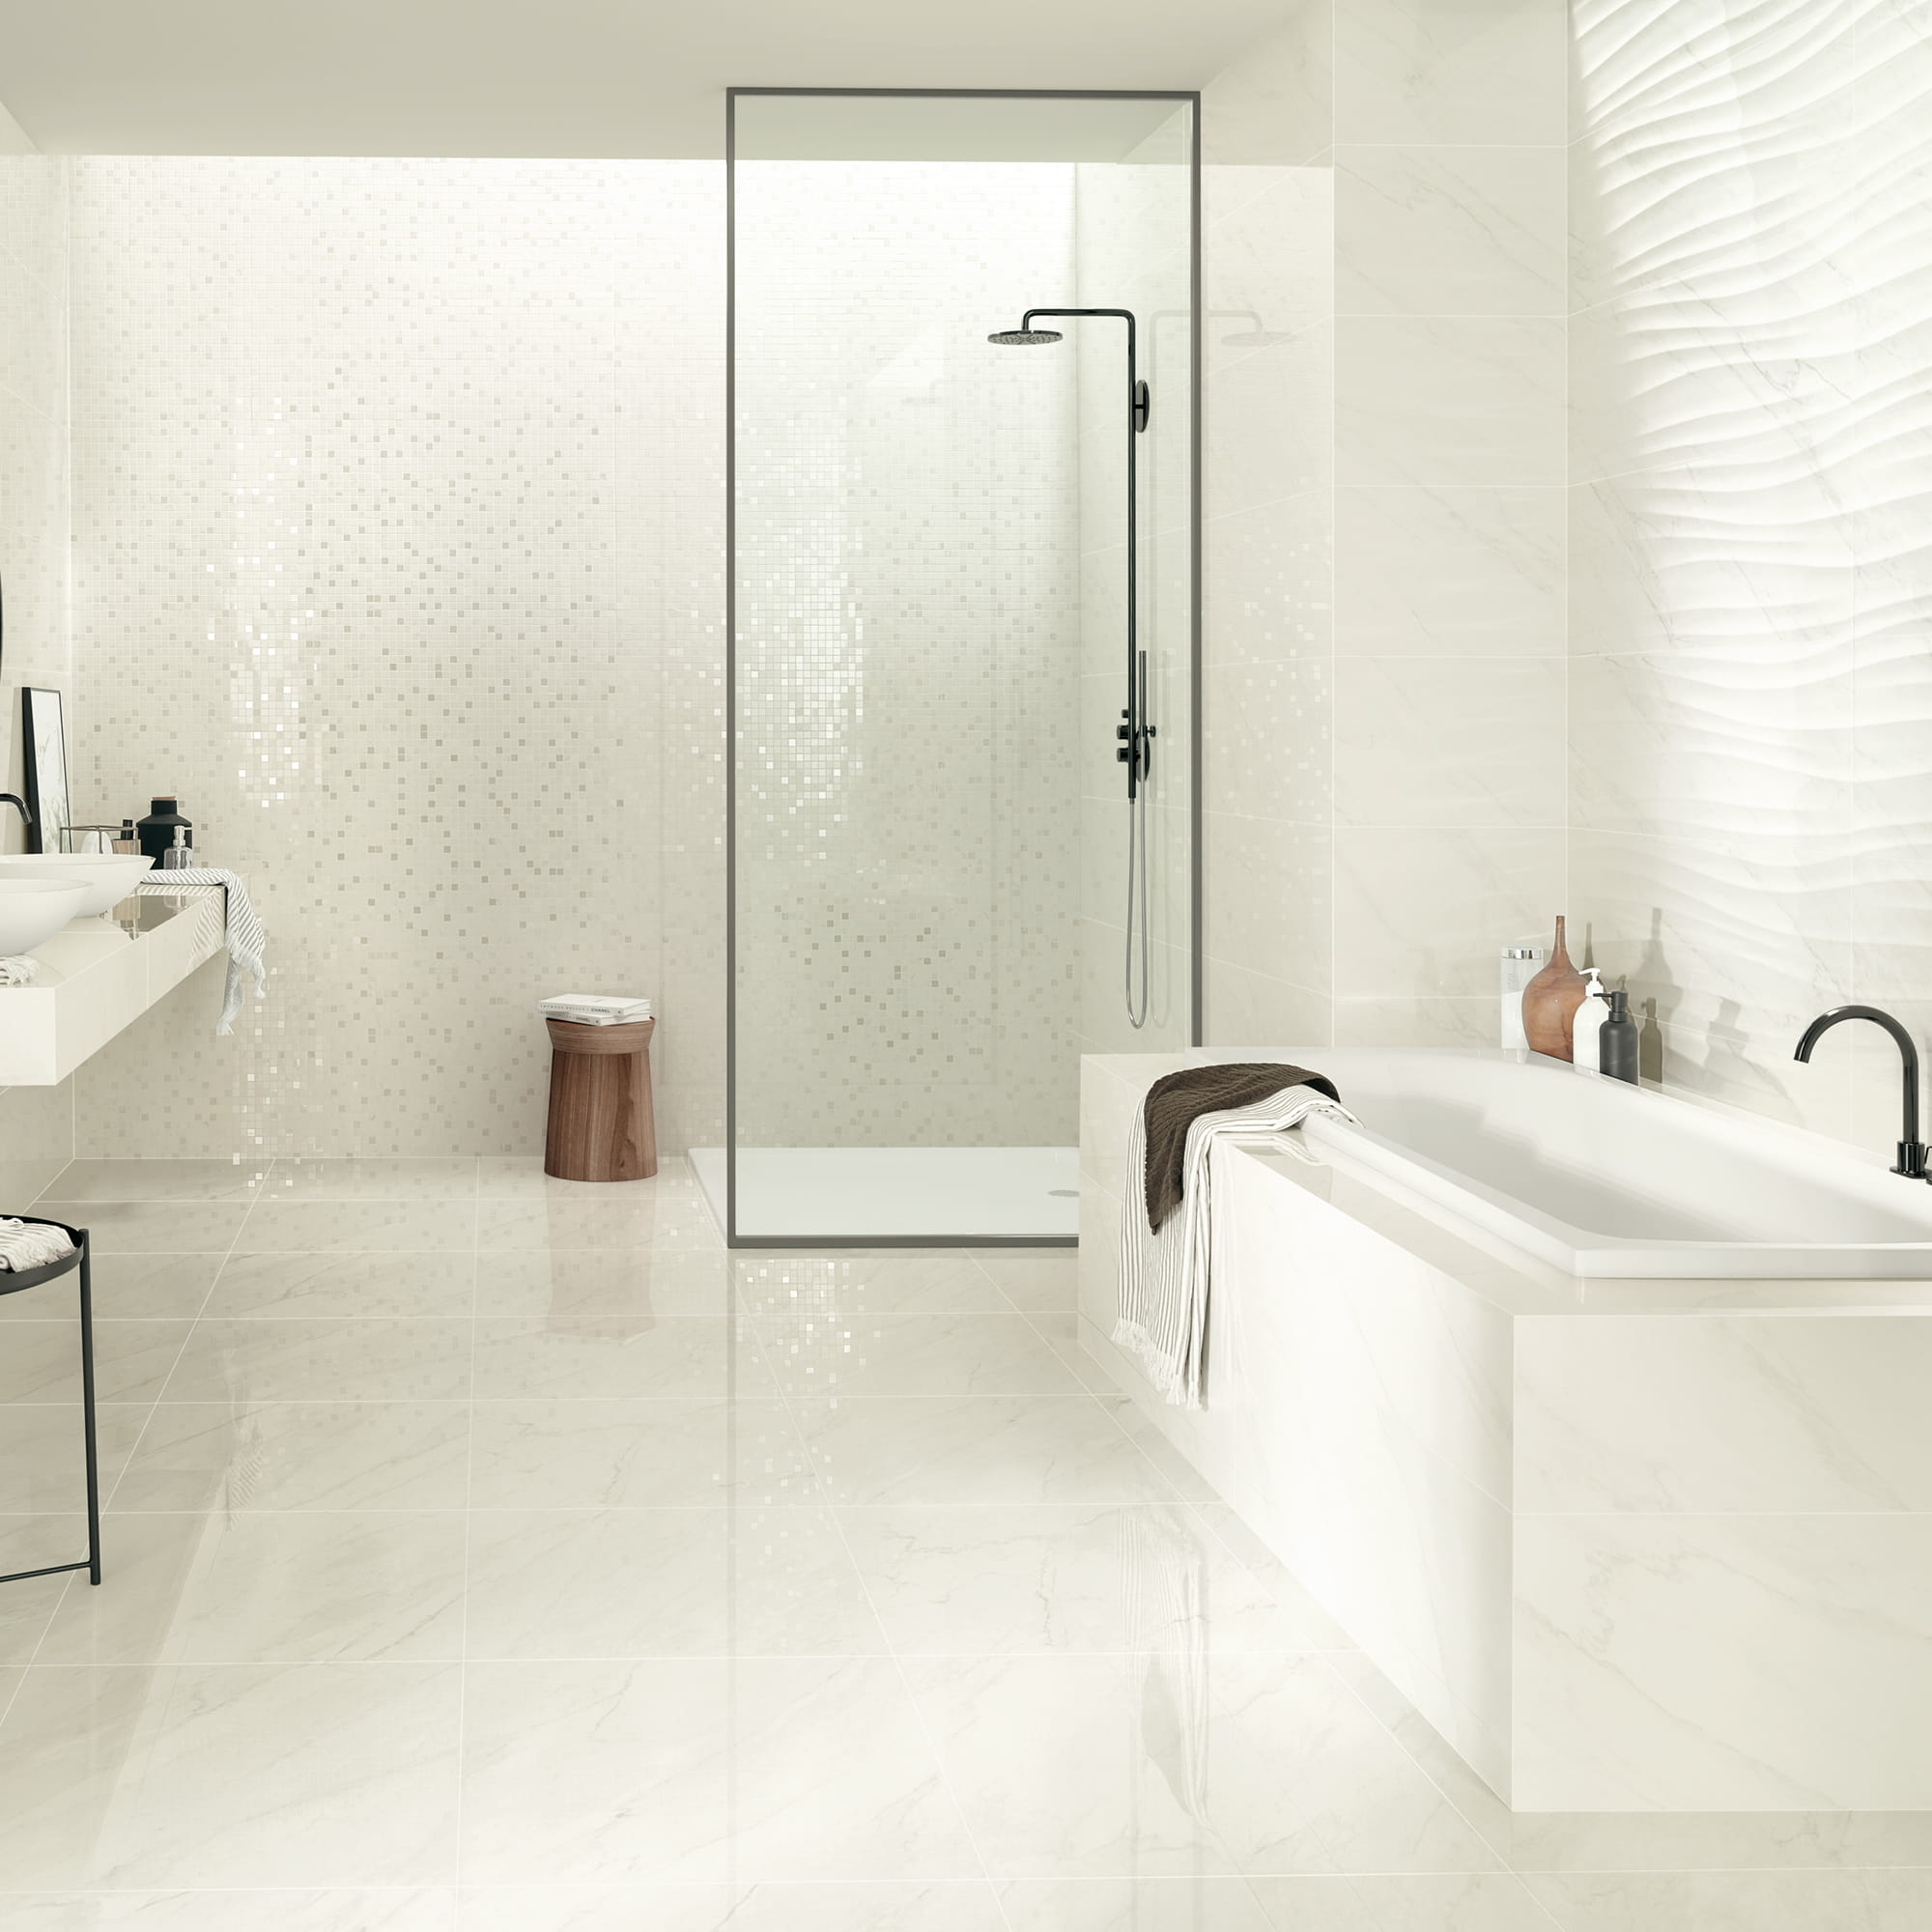 Marble White Shine - 35 x 100 RET. | Mosaic Marble White Shine - 17 x 17 | Marble Shape White Shine - 35 x 100 RET. | Marble White Pol. - 60 x 60 RET.